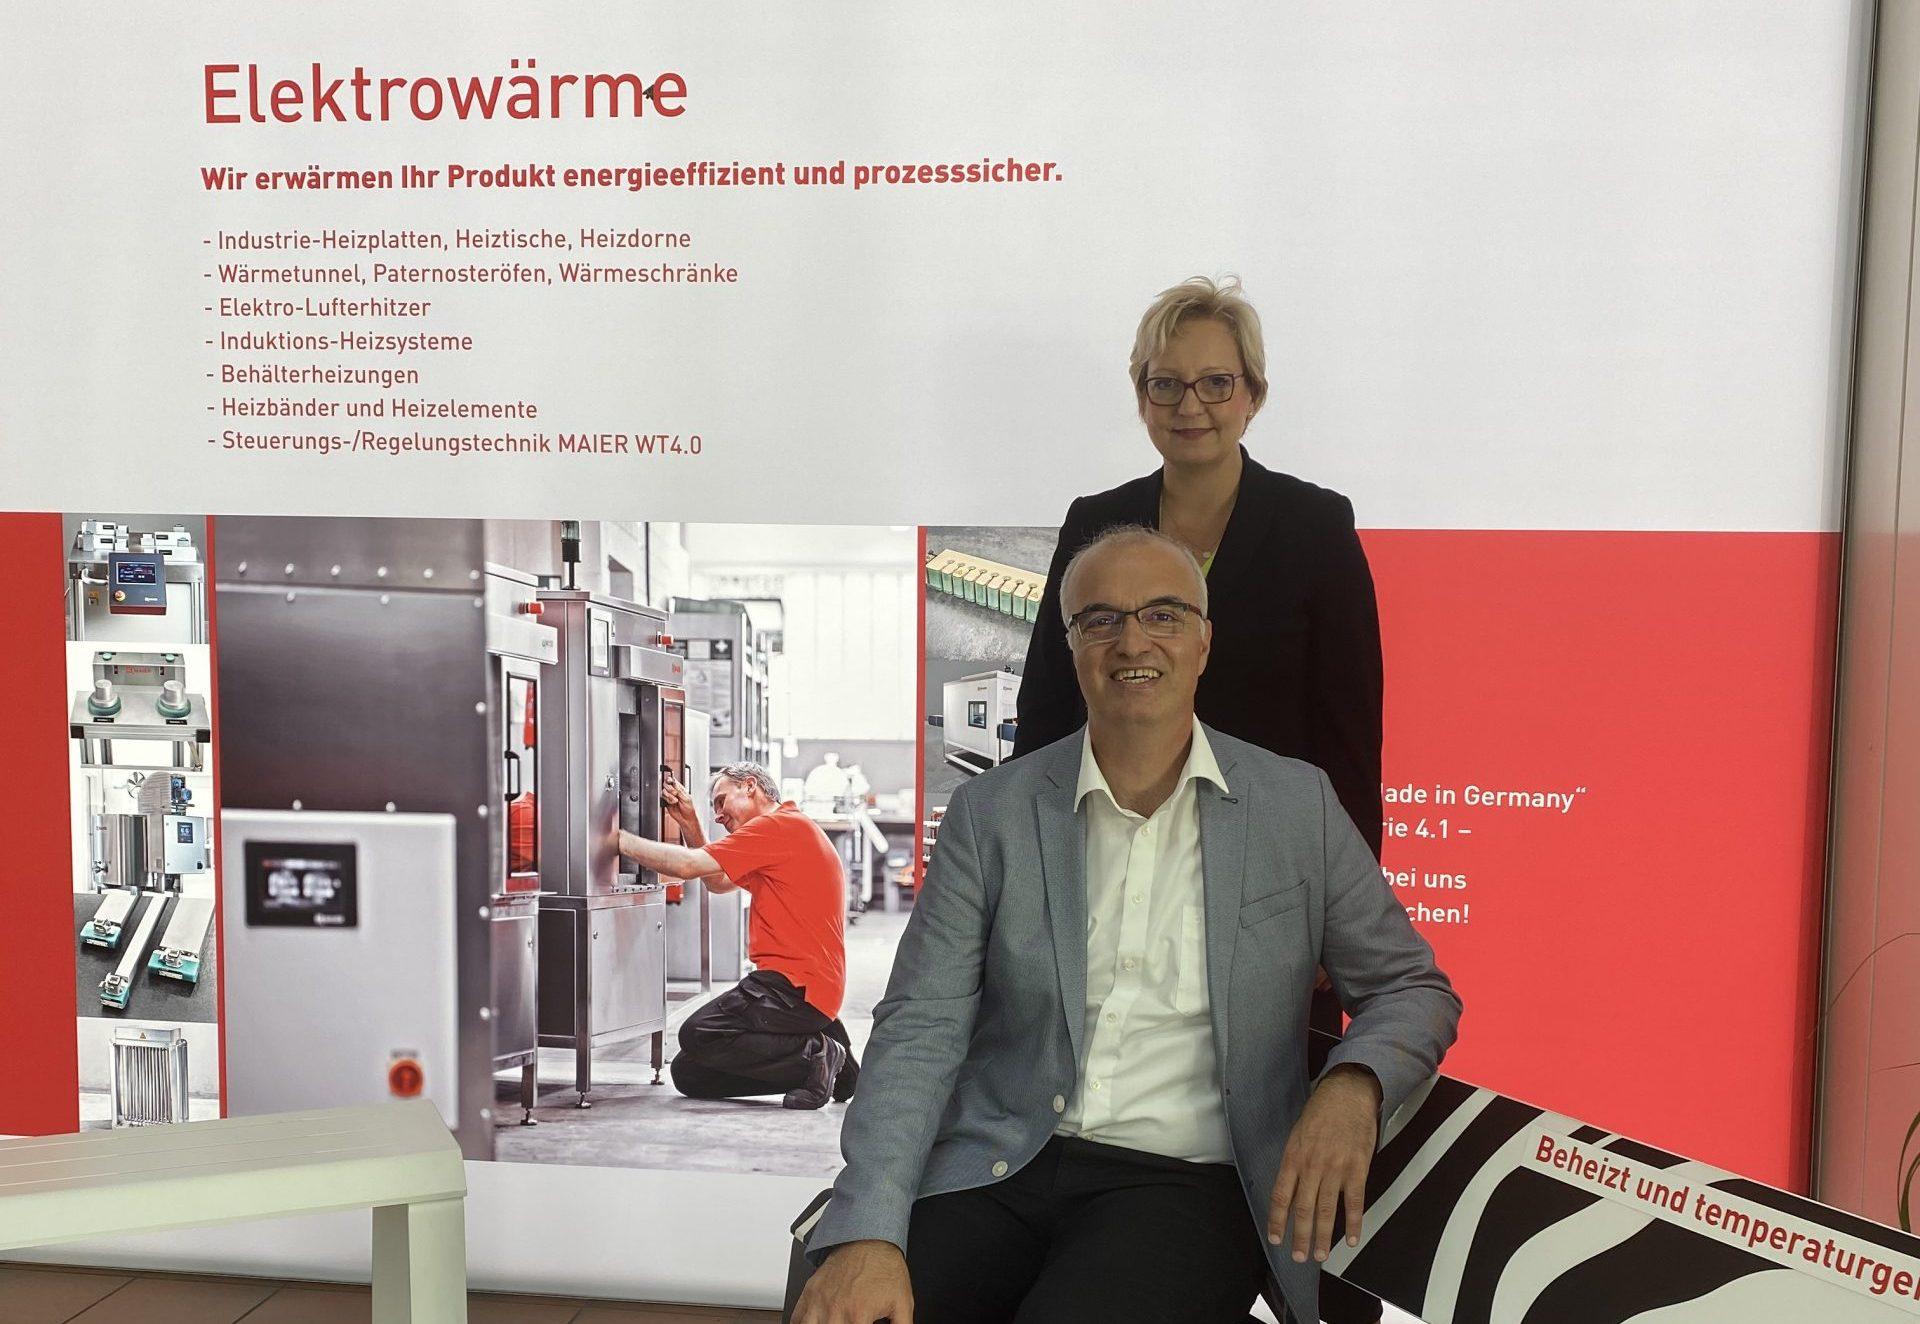 Ramazan Selcuk, Landtagsabgeordneter Baden-Württemberg und Kristin Maier-Müller, G. MAIER Elektrotechnik GmbH